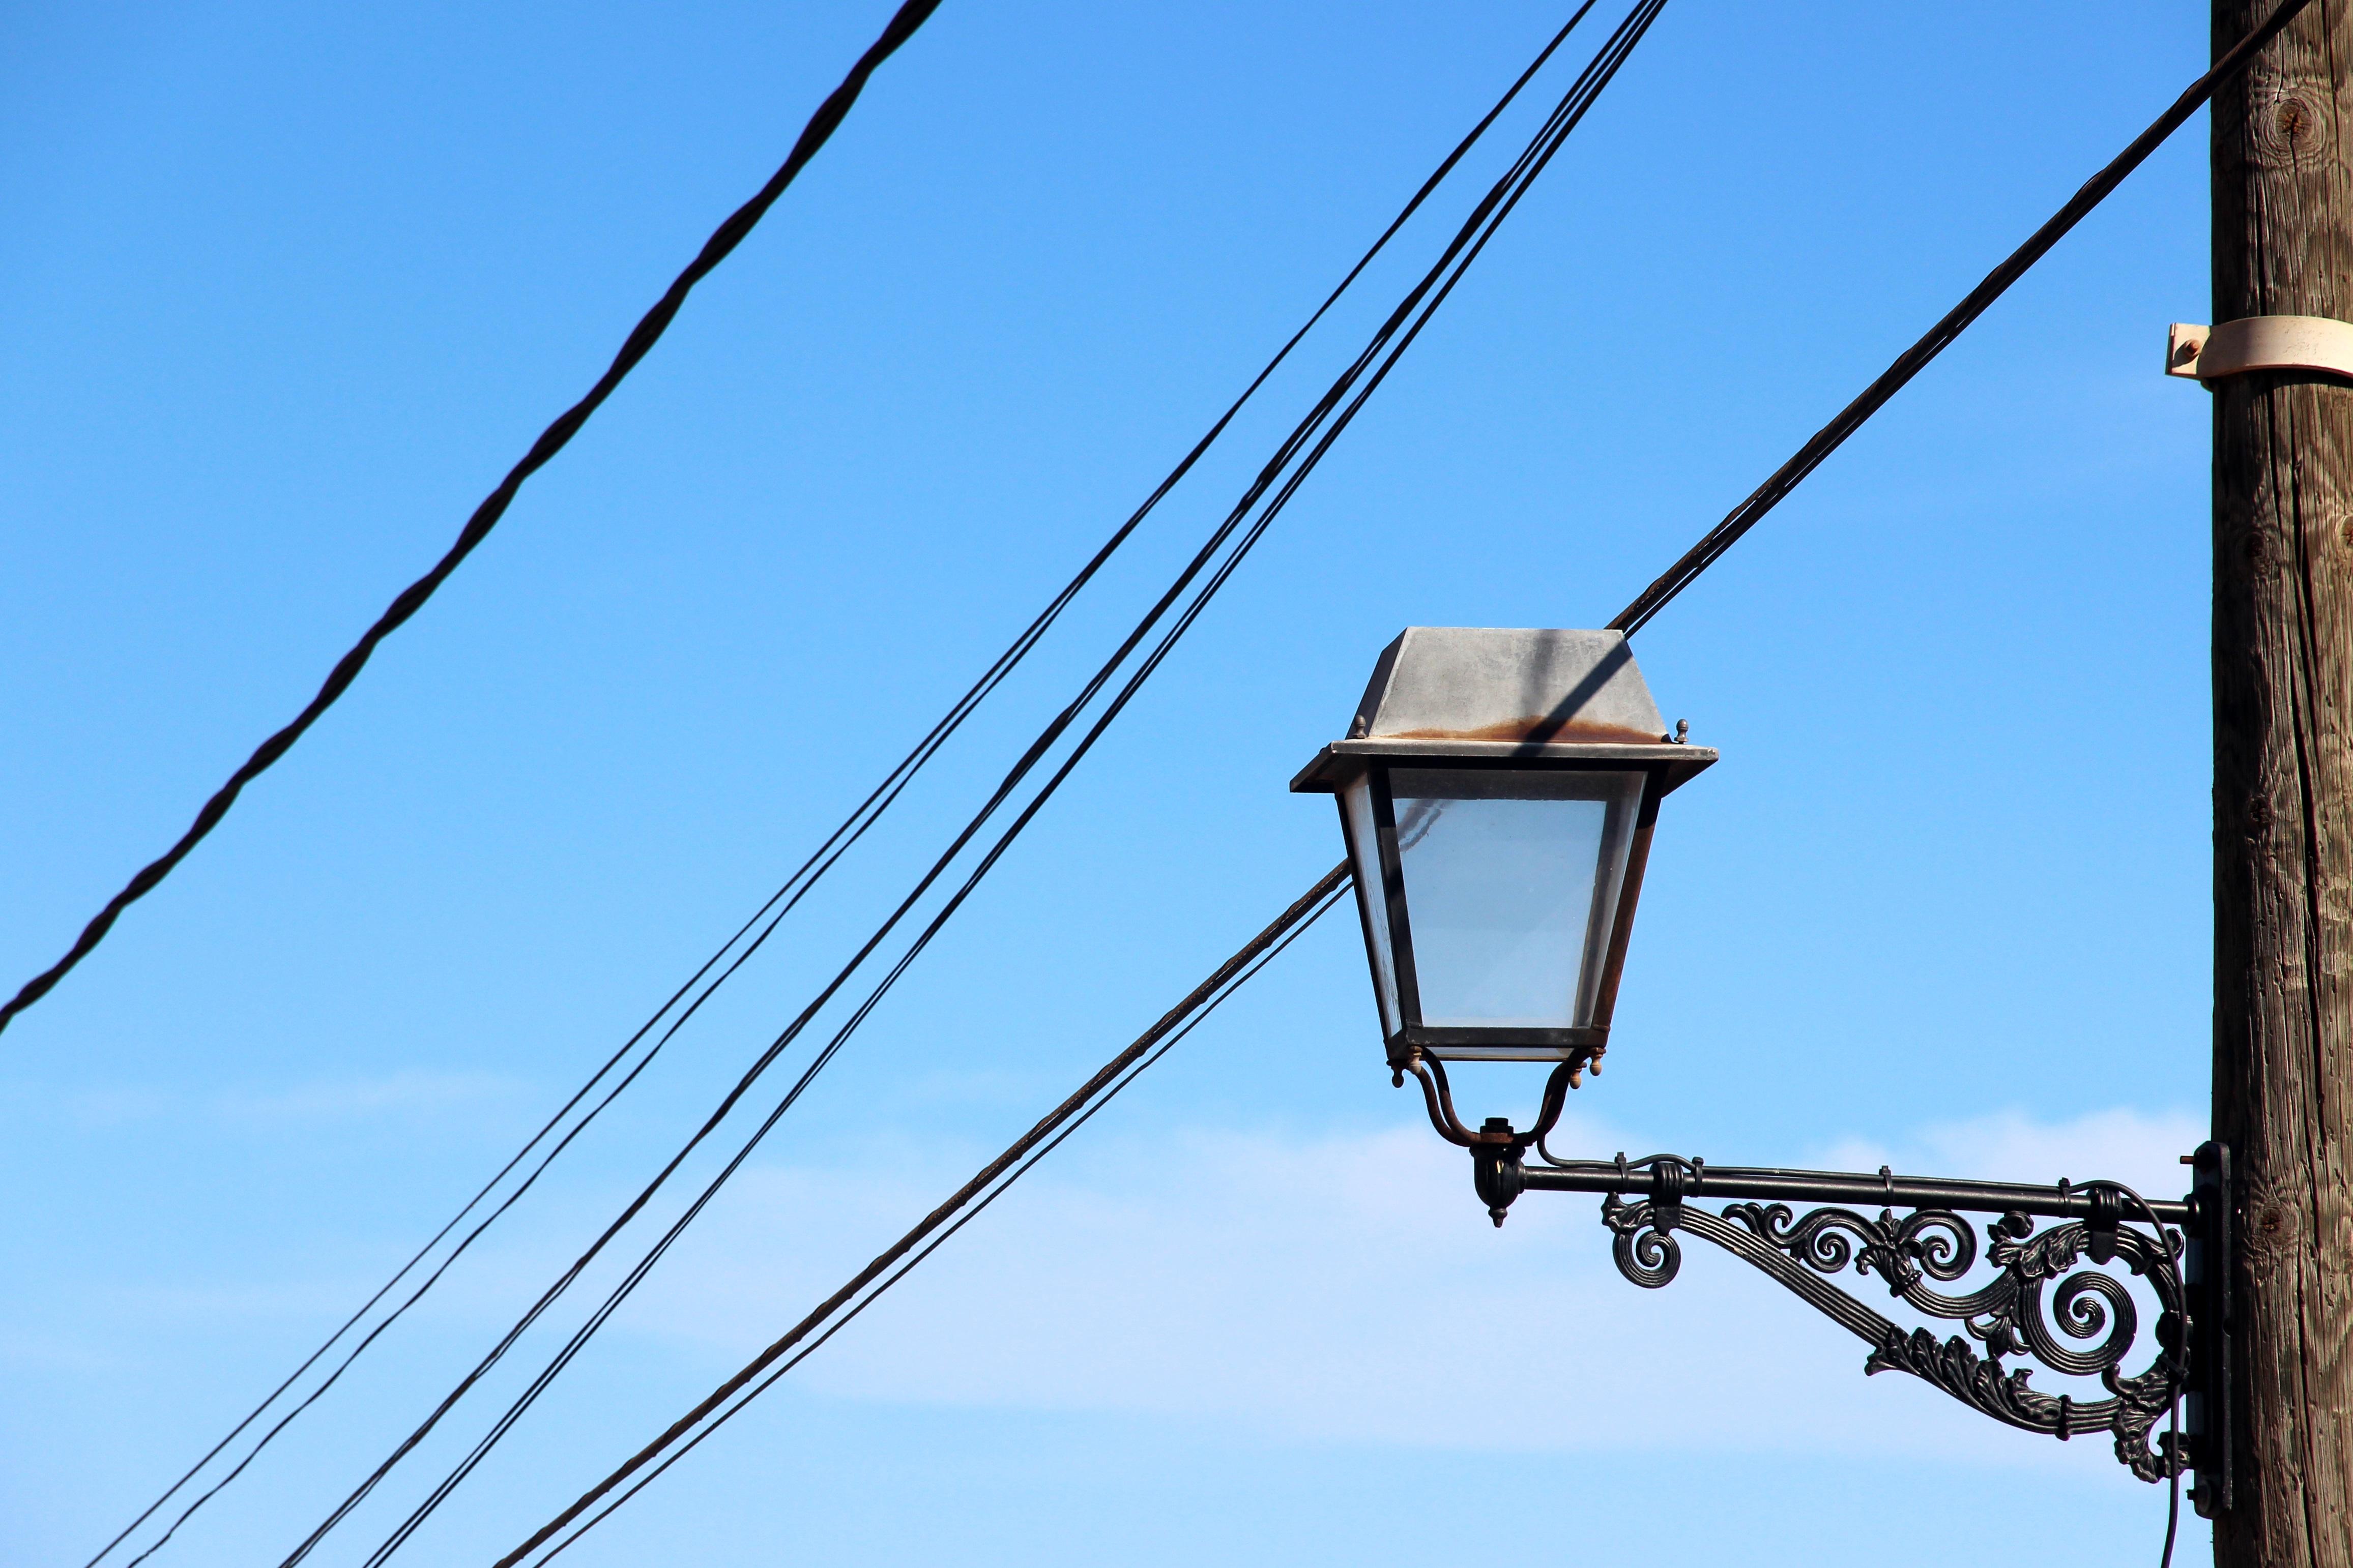 Light Sky Line Lantern Tower Mast Metal Blue Street Lamp Electricity Lighting